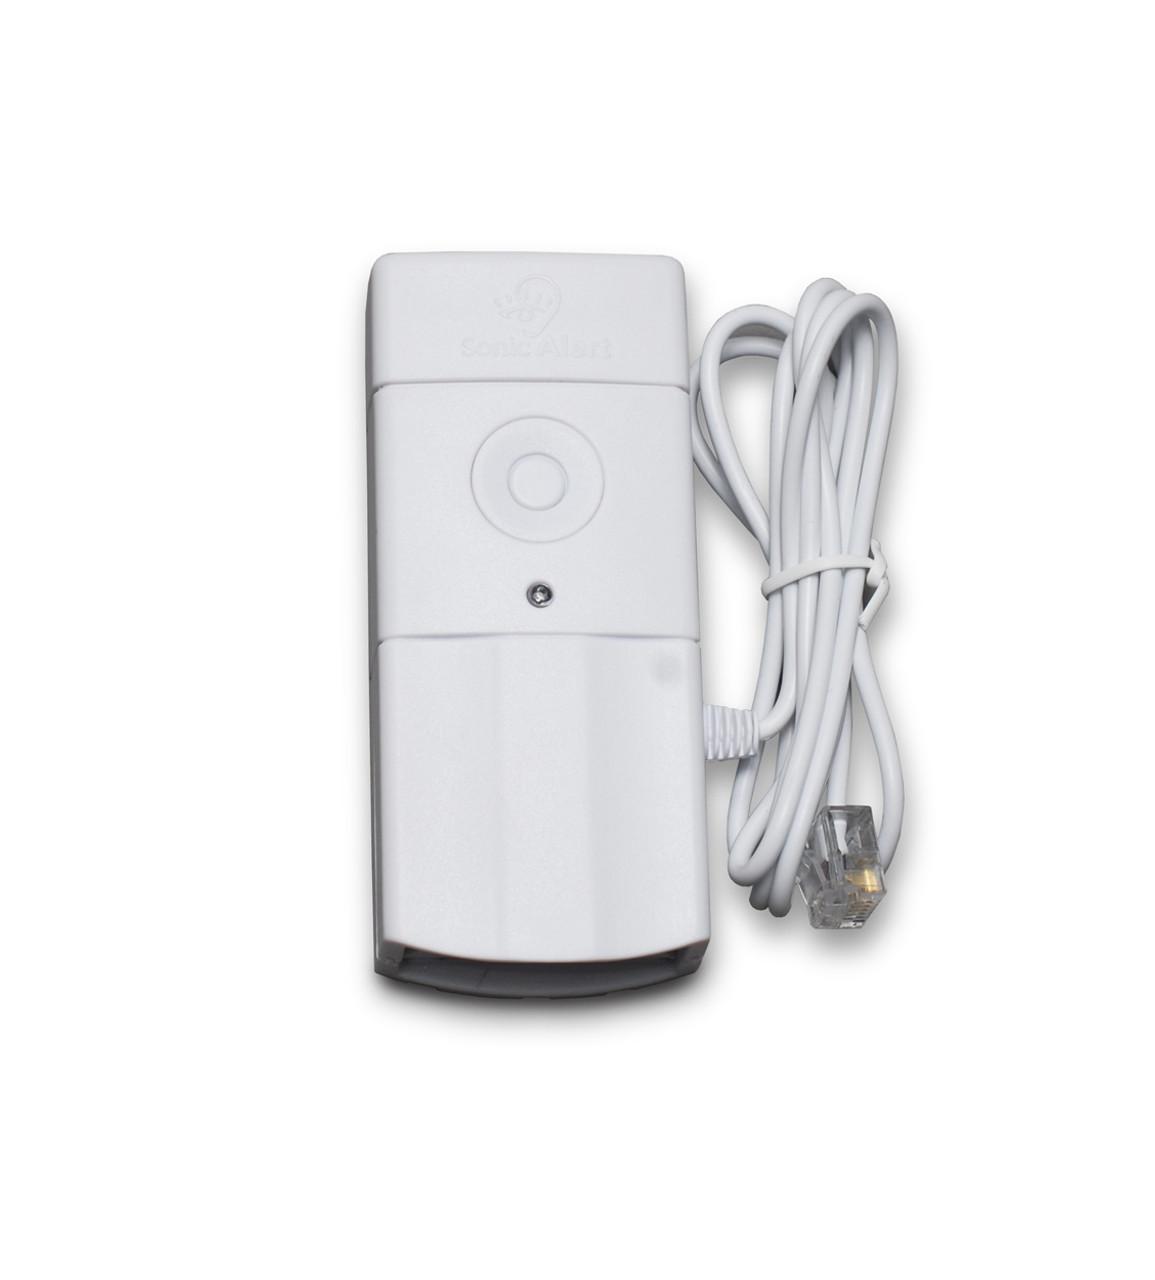 Remote Phone Transmitter - HomeAware Alerting System